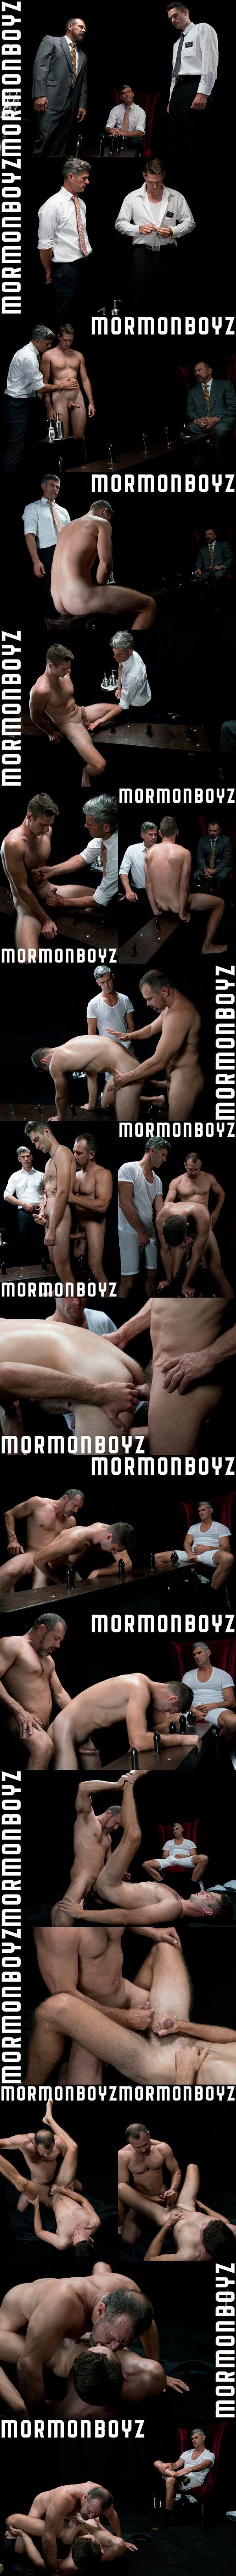 Macho daddy President Ballard barebacks Elder Dobrovnik in Atonement at Mormonboyz 02